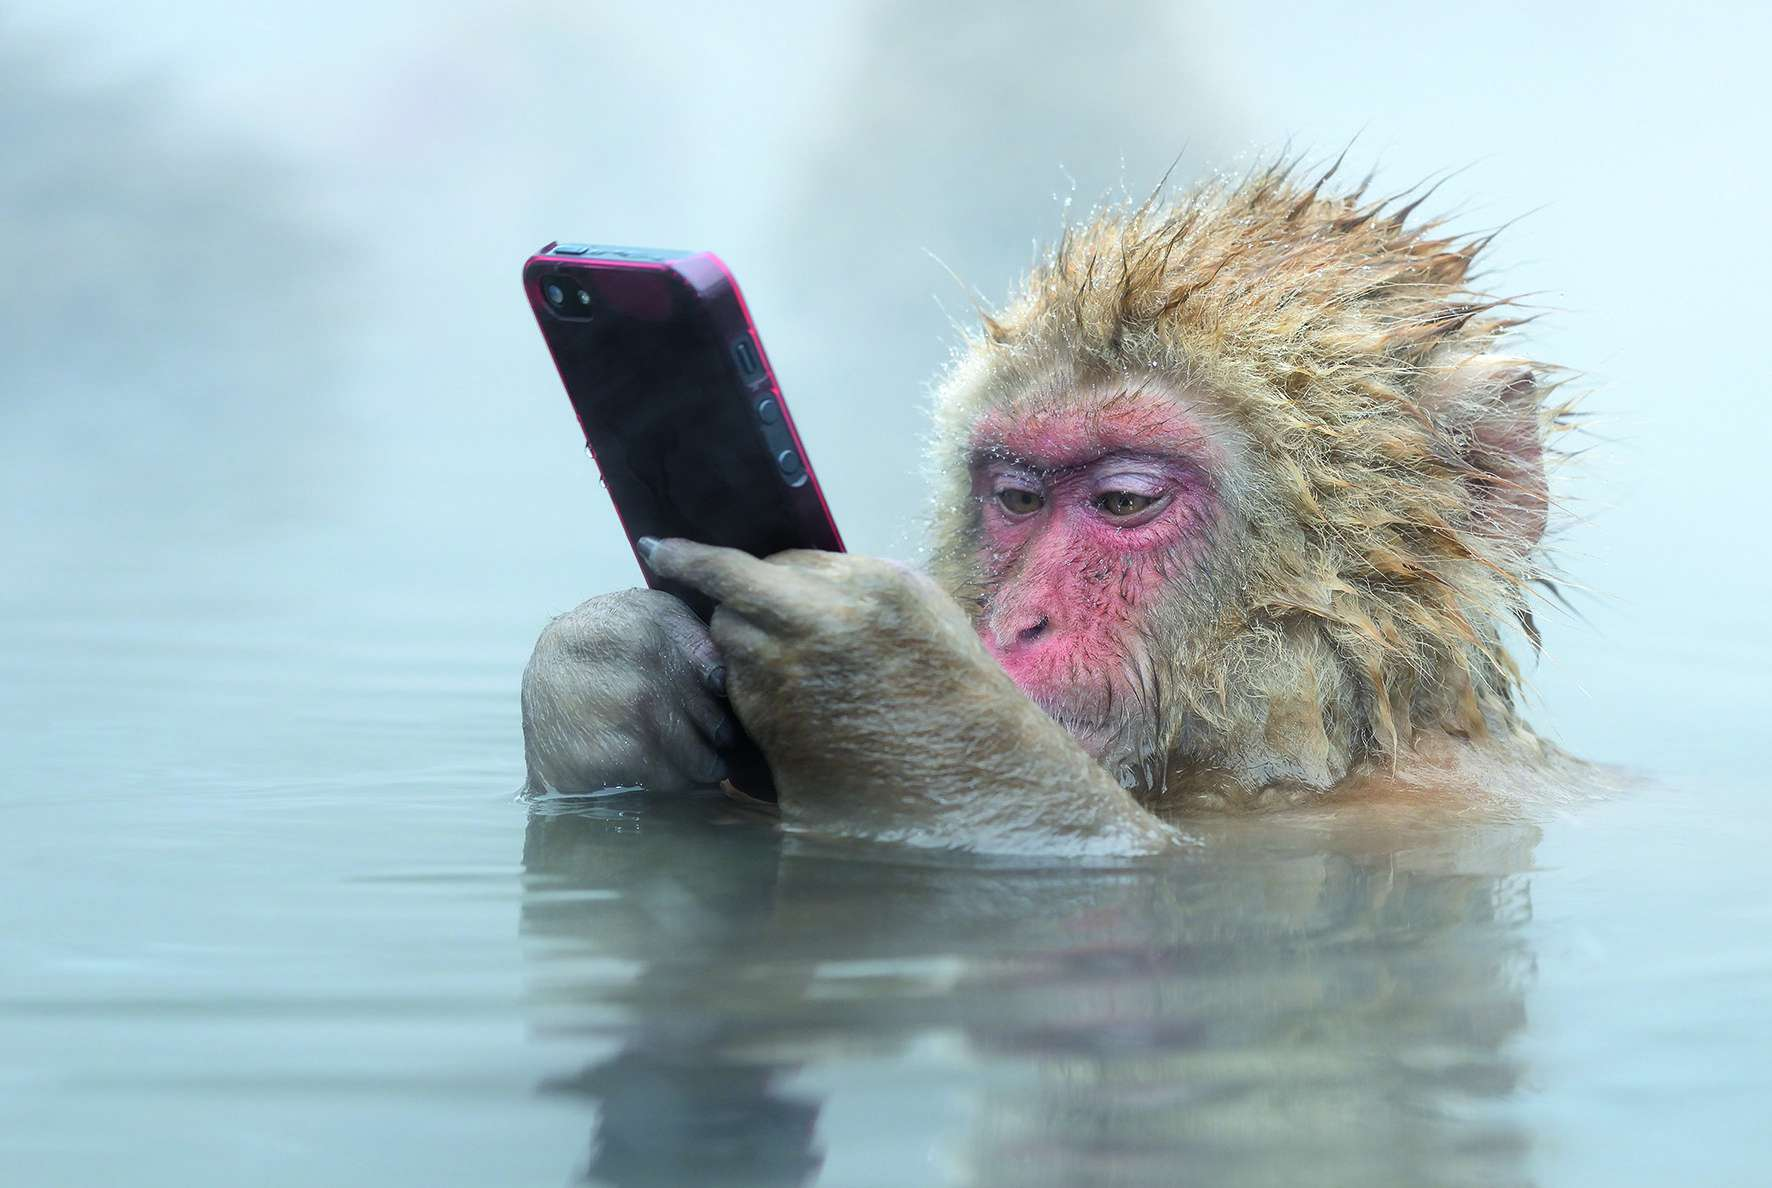 snow monkey with iPhone